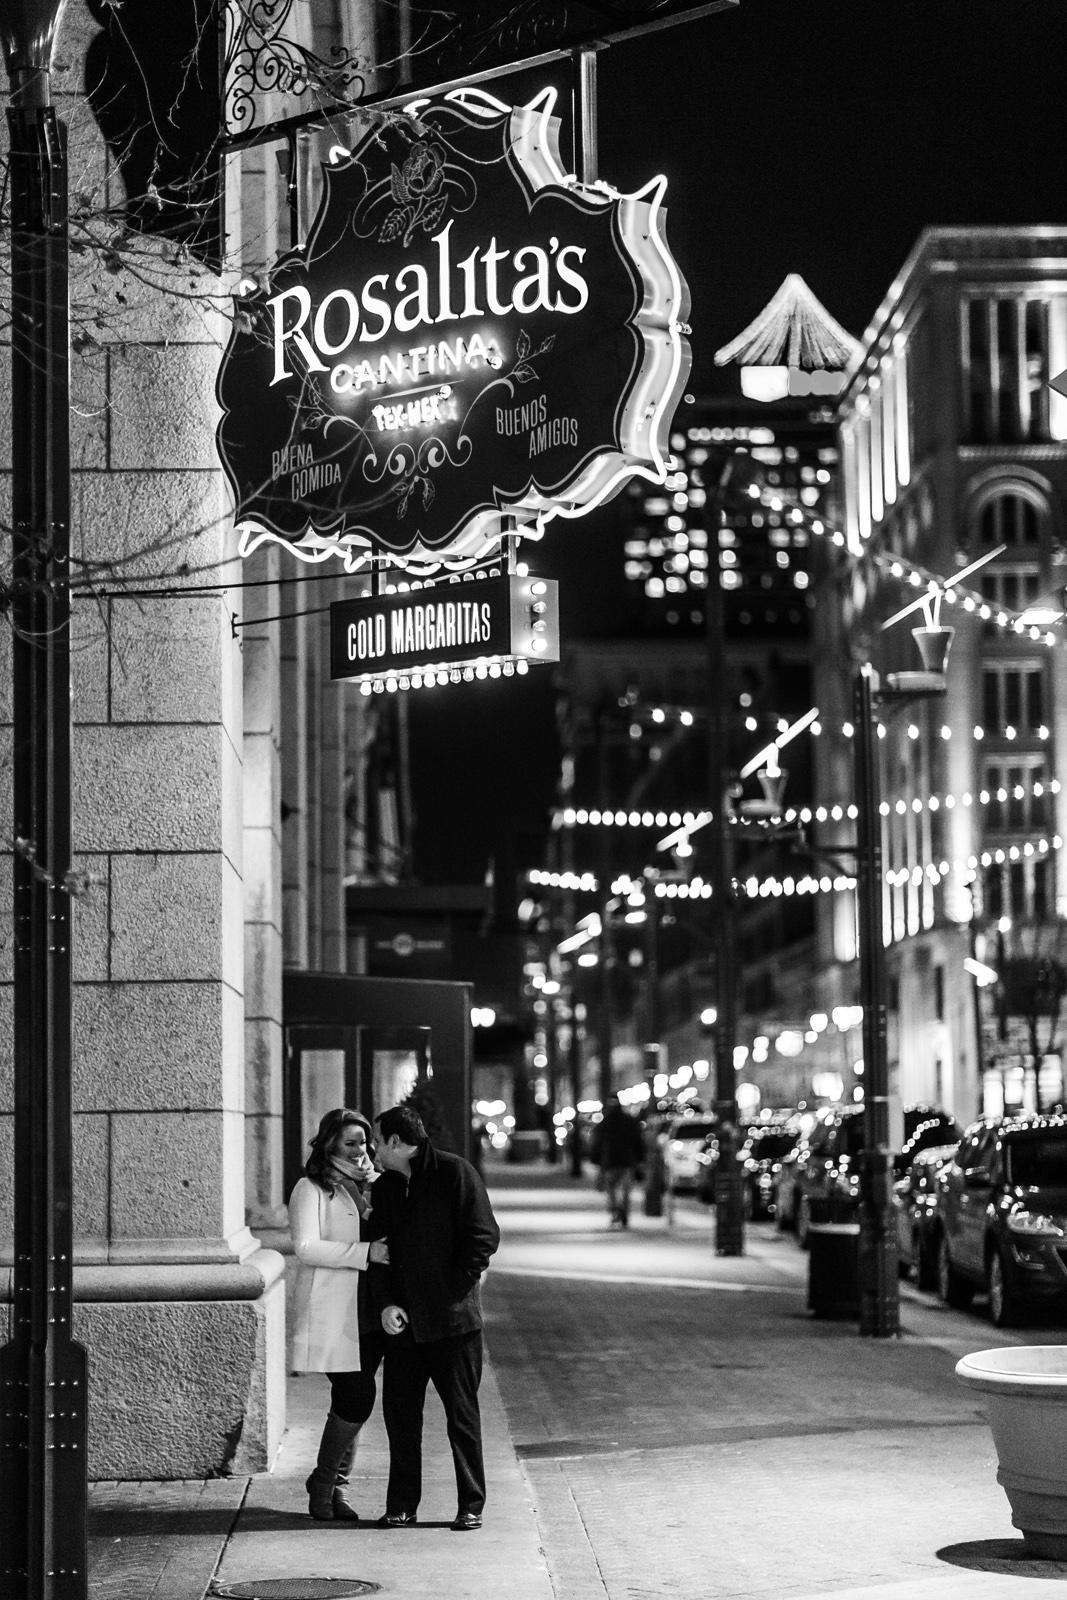 St_Louis_Rosalitas_Engagement_Photography_20141229_182940-2.jpg